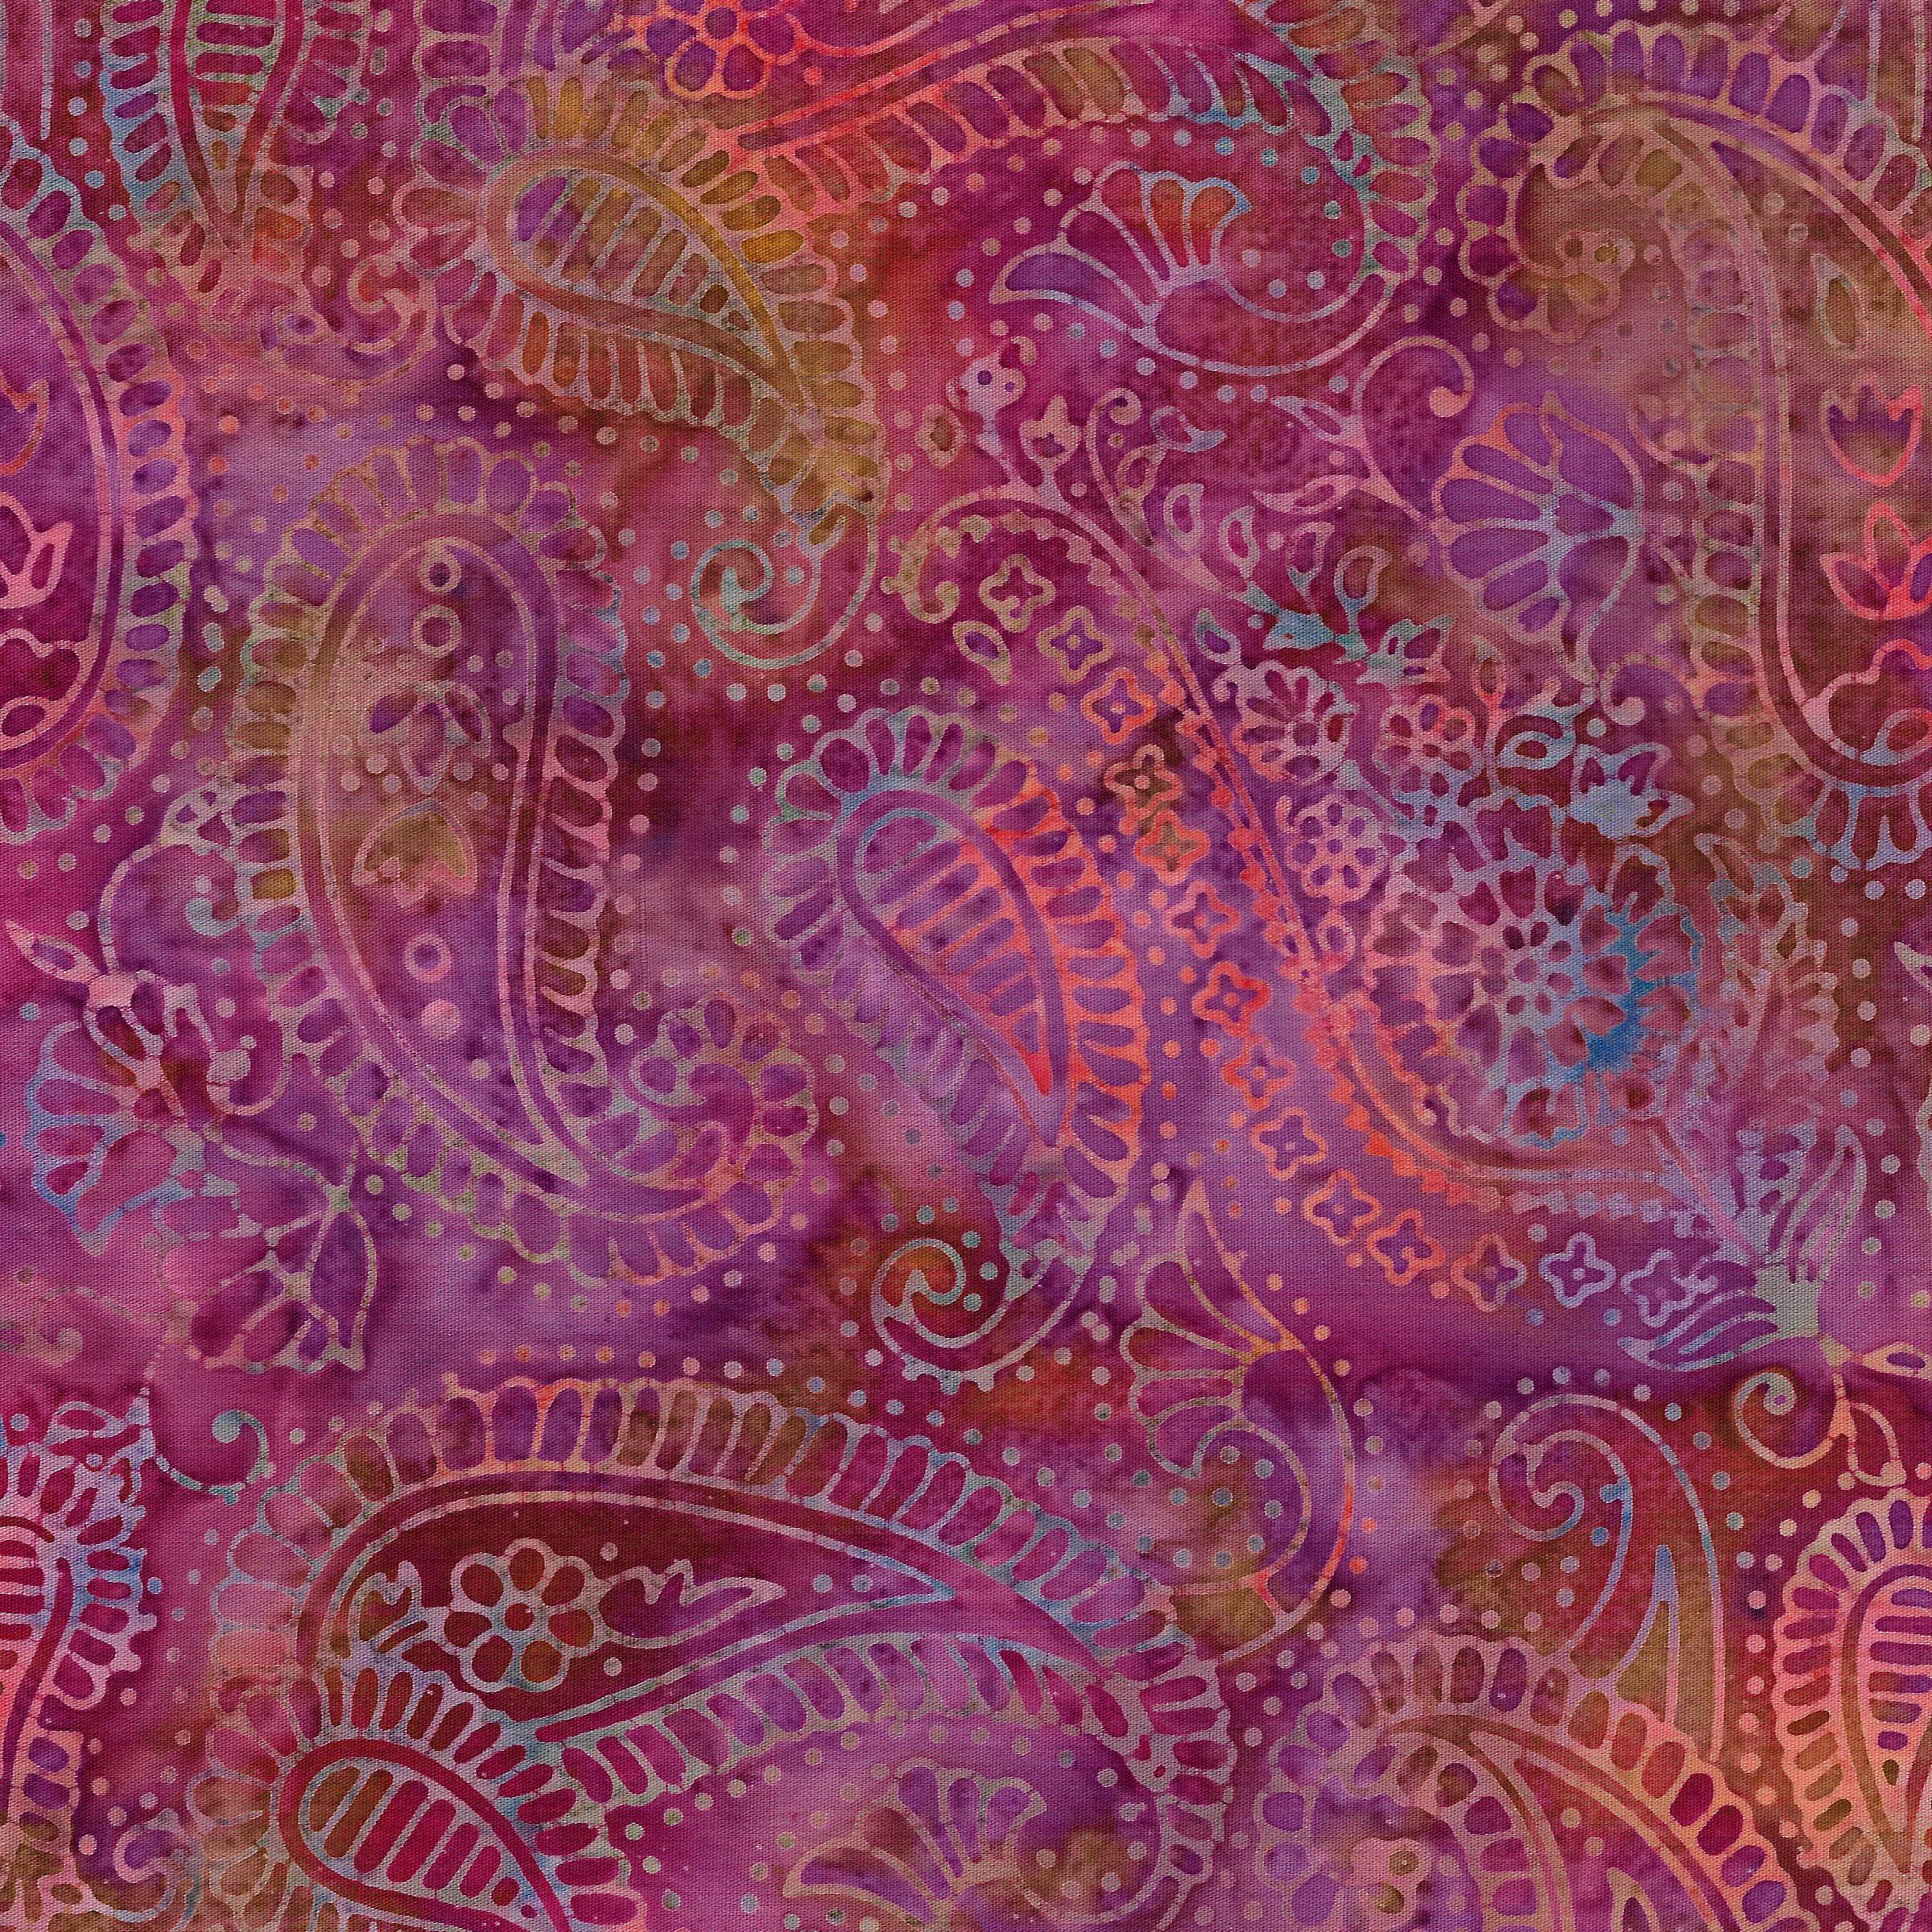 Paisley Outling-Sherbet